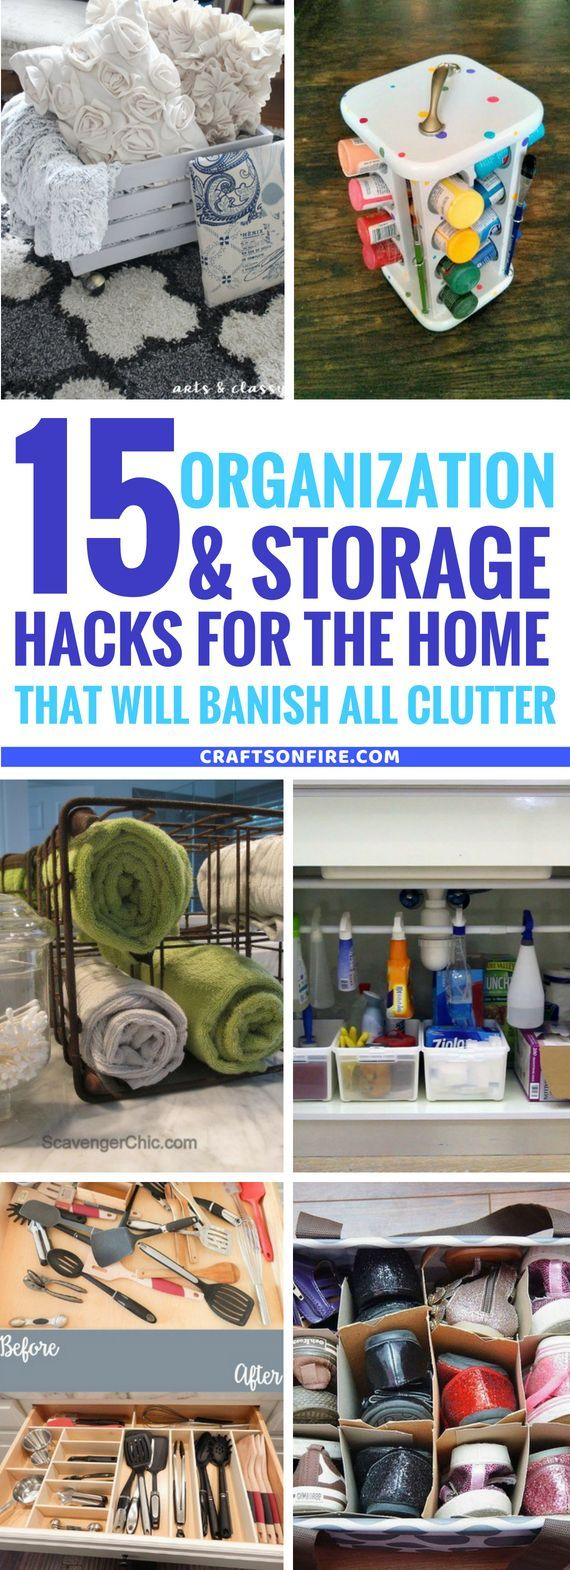 15 Home Organization And Storage Hacks That